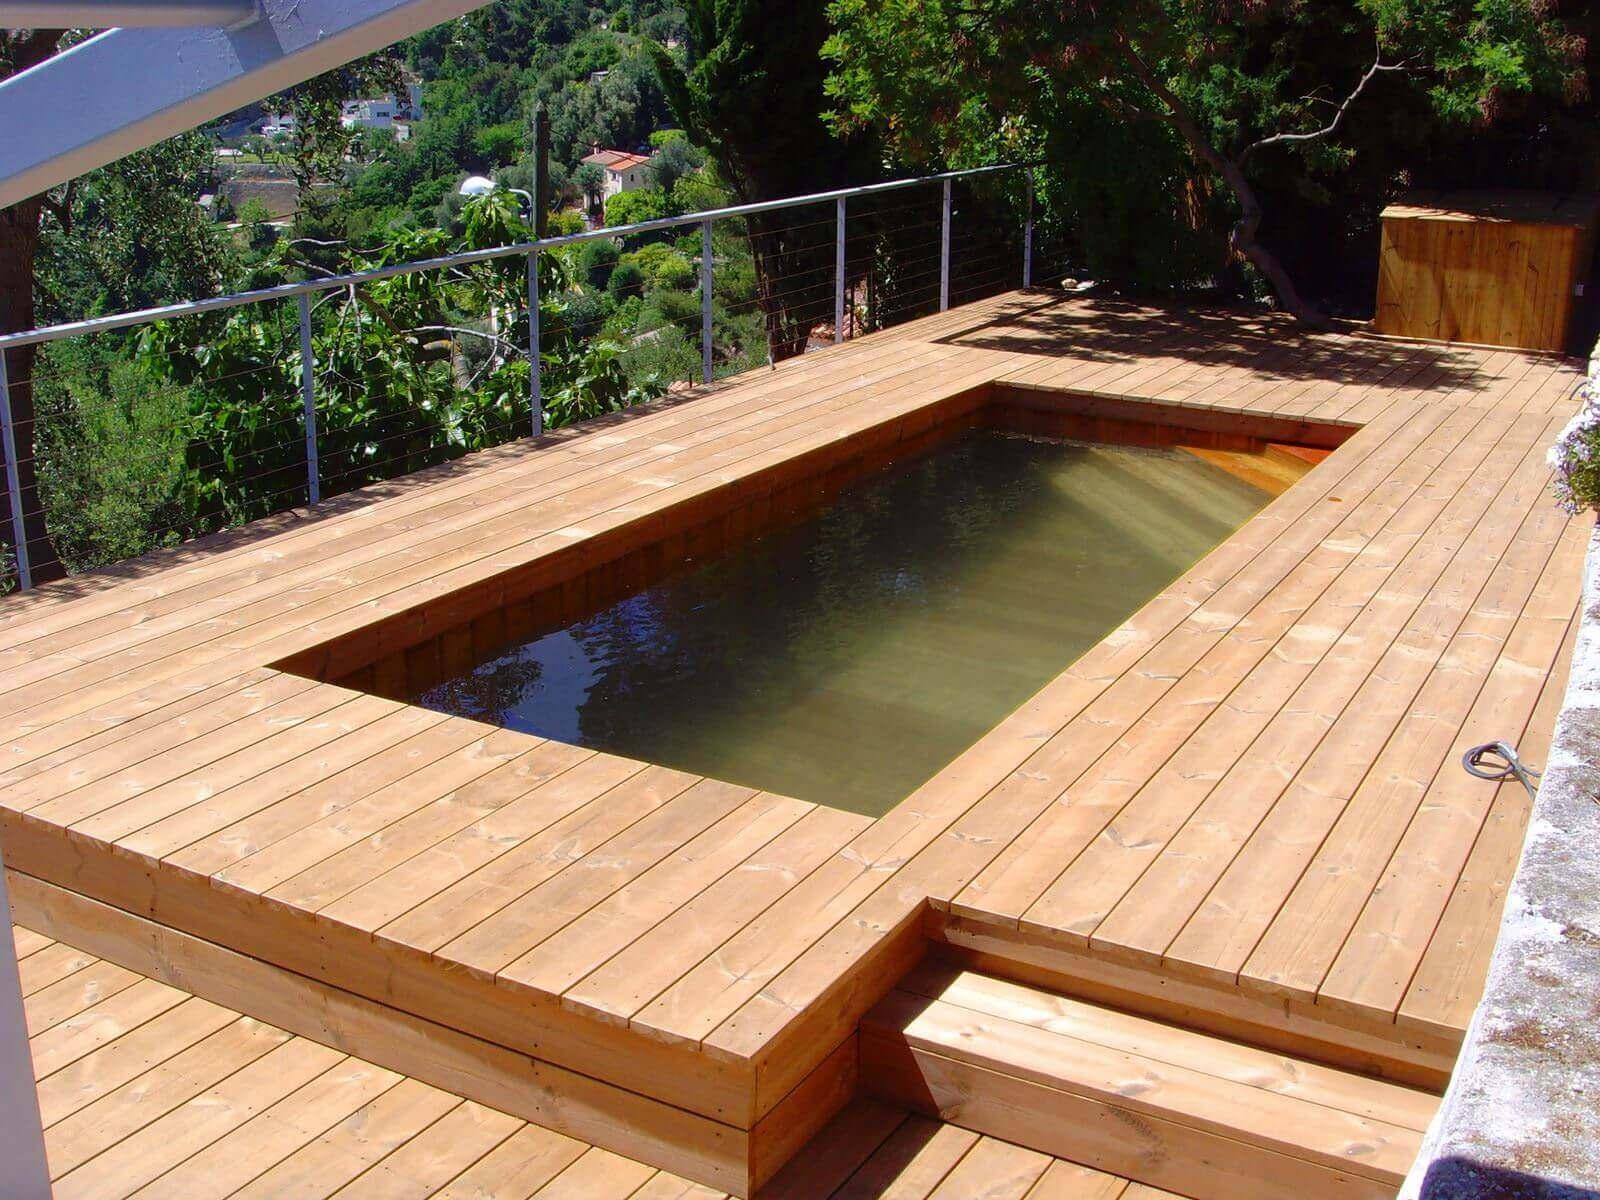 mini piscines bois petite piscine bois bluewood of mini piscine bois enterree. Black Bedroom Furniture Sets. Home Design Ideas